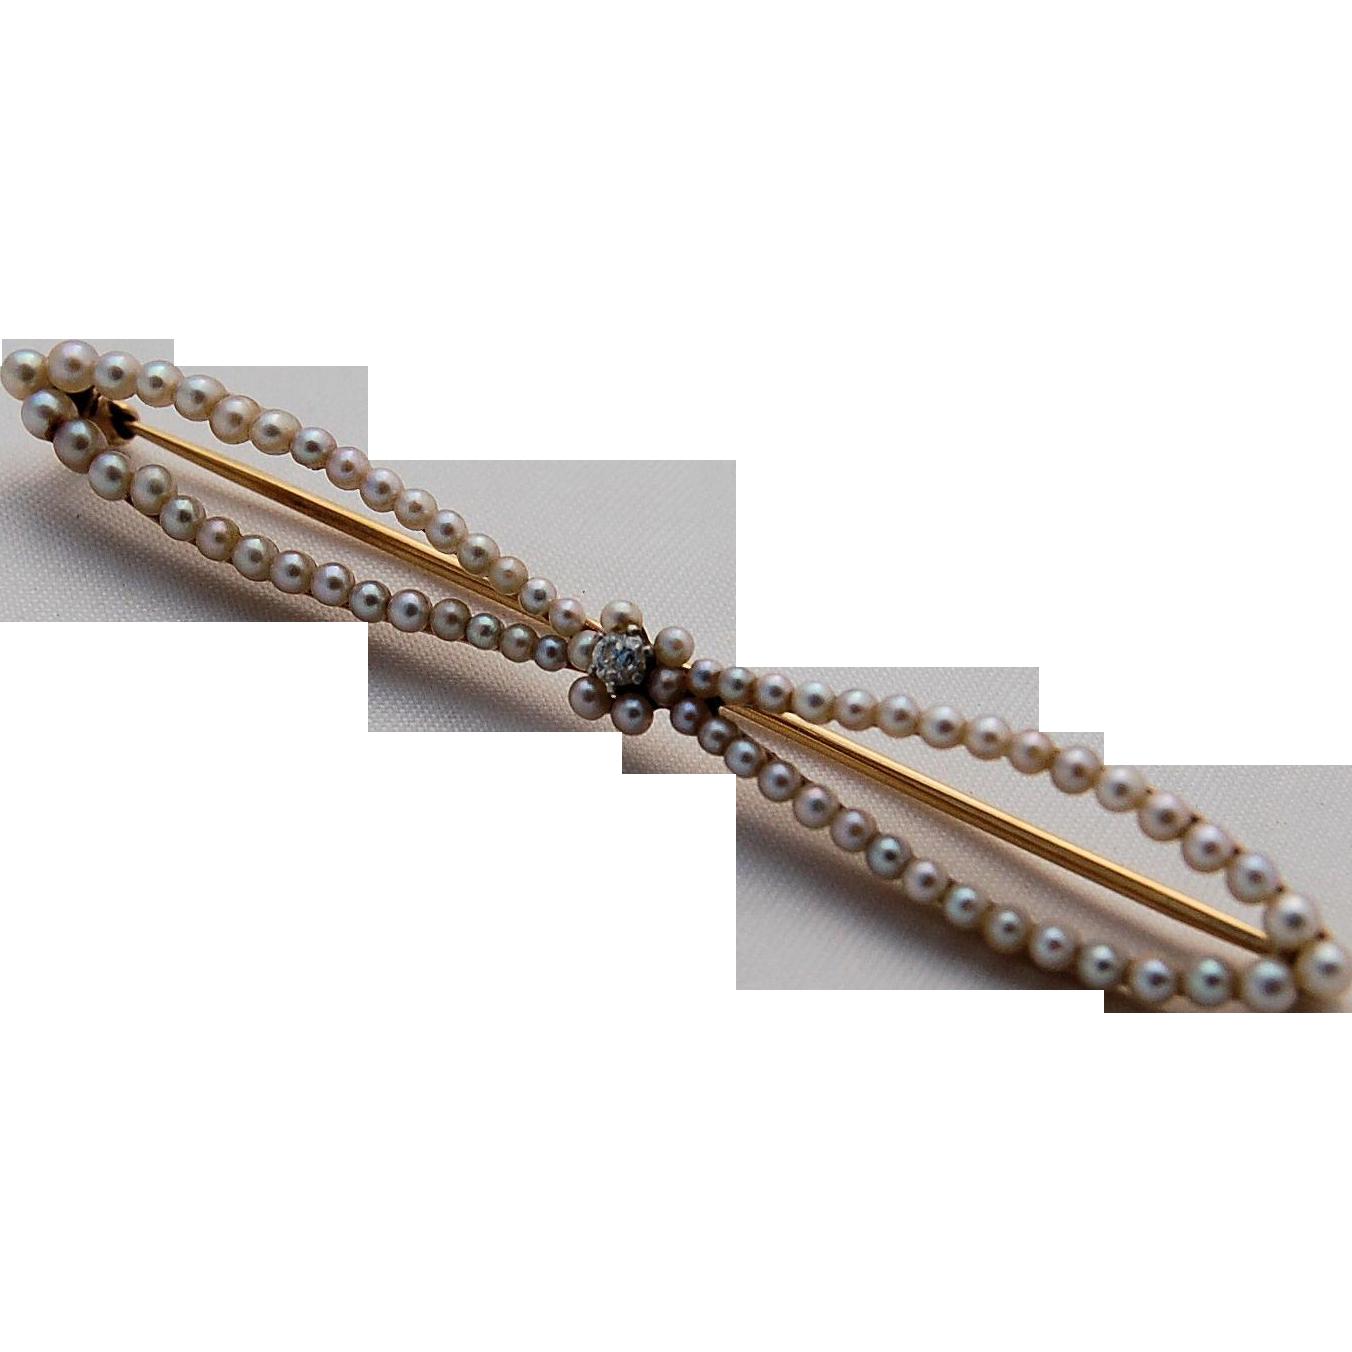 14k Gold Pearls Diamond Bow Pin Late Victorian Edwardian Antique circa 1886-1910